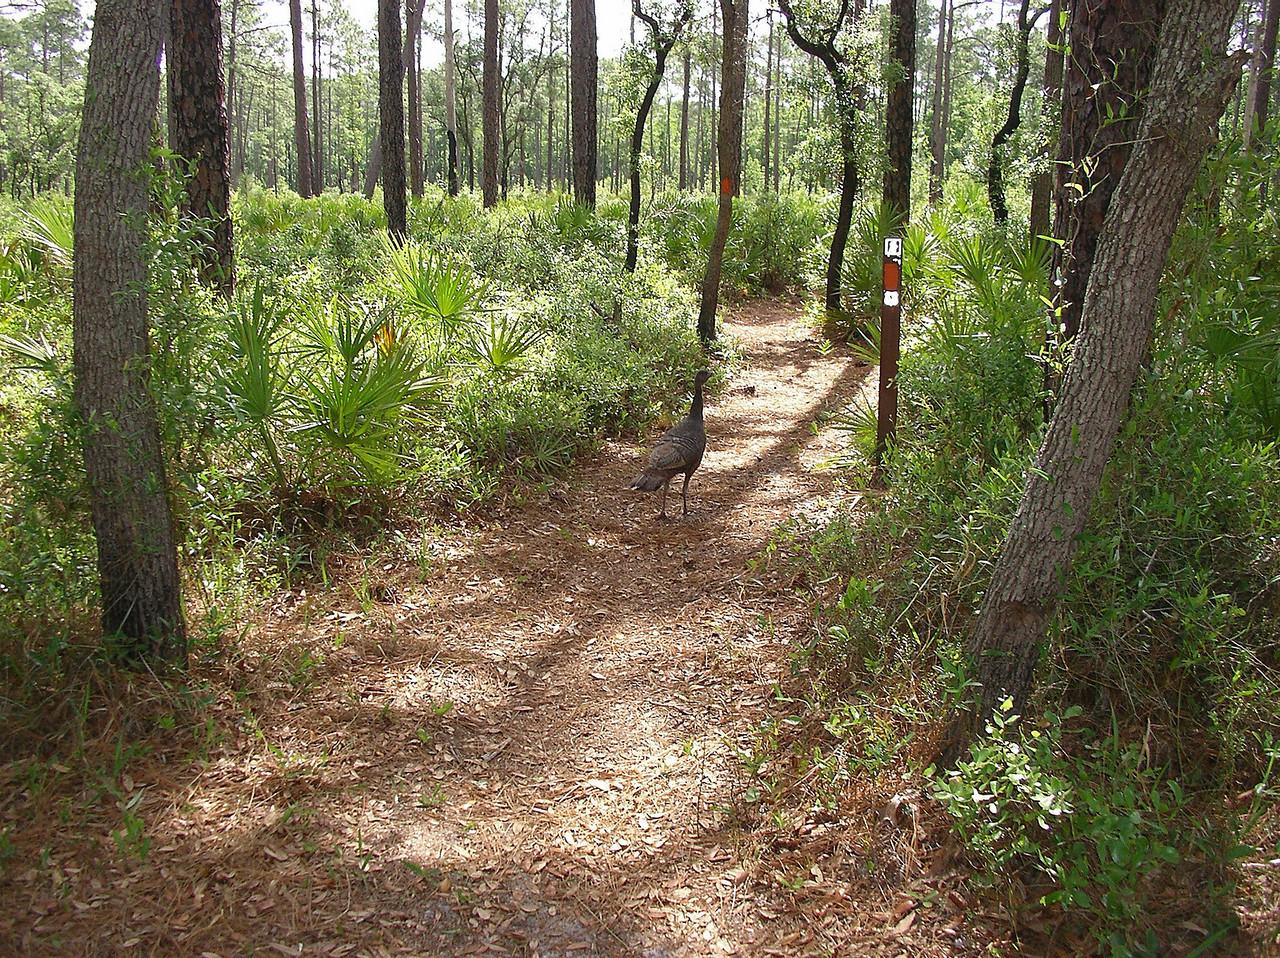 Wild Turkey (Meleagris gallopavo)<br /> Photo credit: Ian Brown / Florida Trail Association